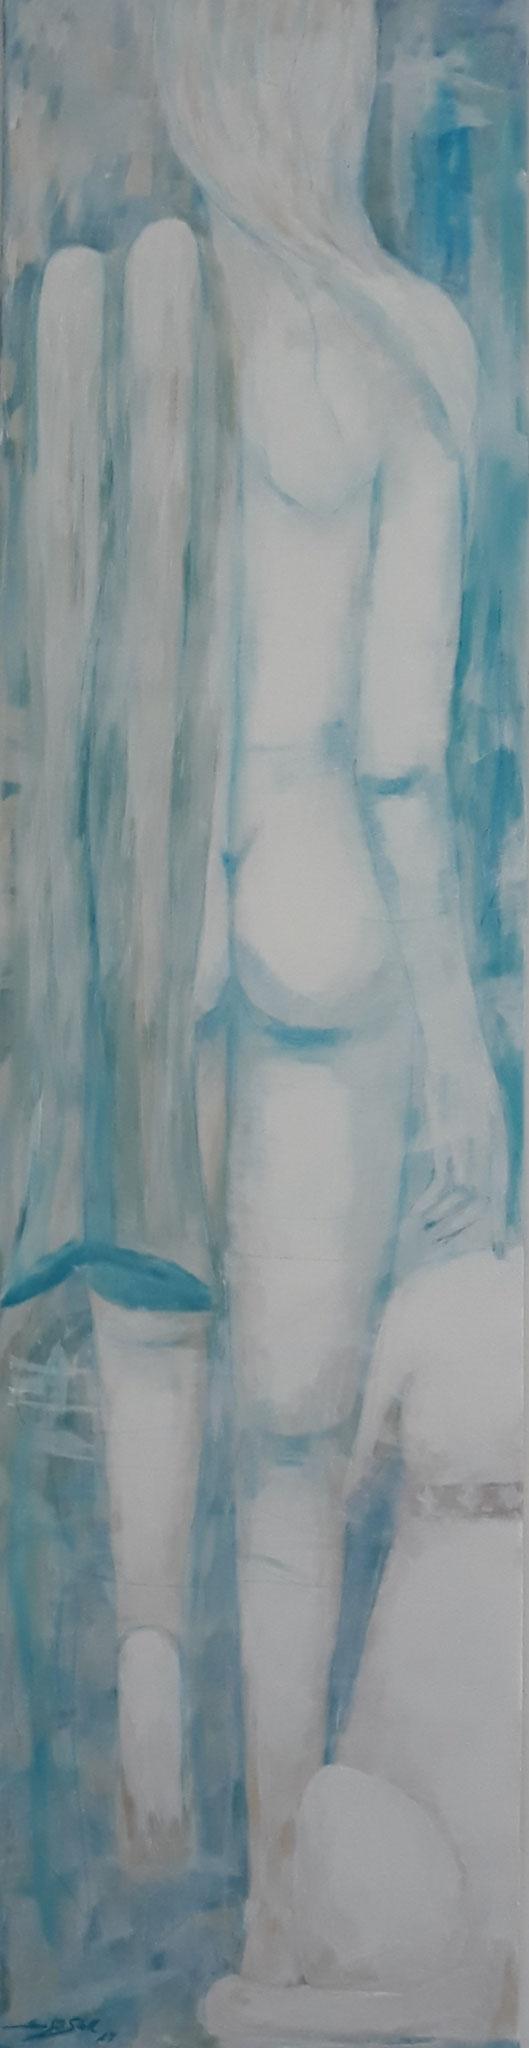 """Ira & Nelson"", Acryl auf Leinwand, 200 x 55 cm, verkauft"